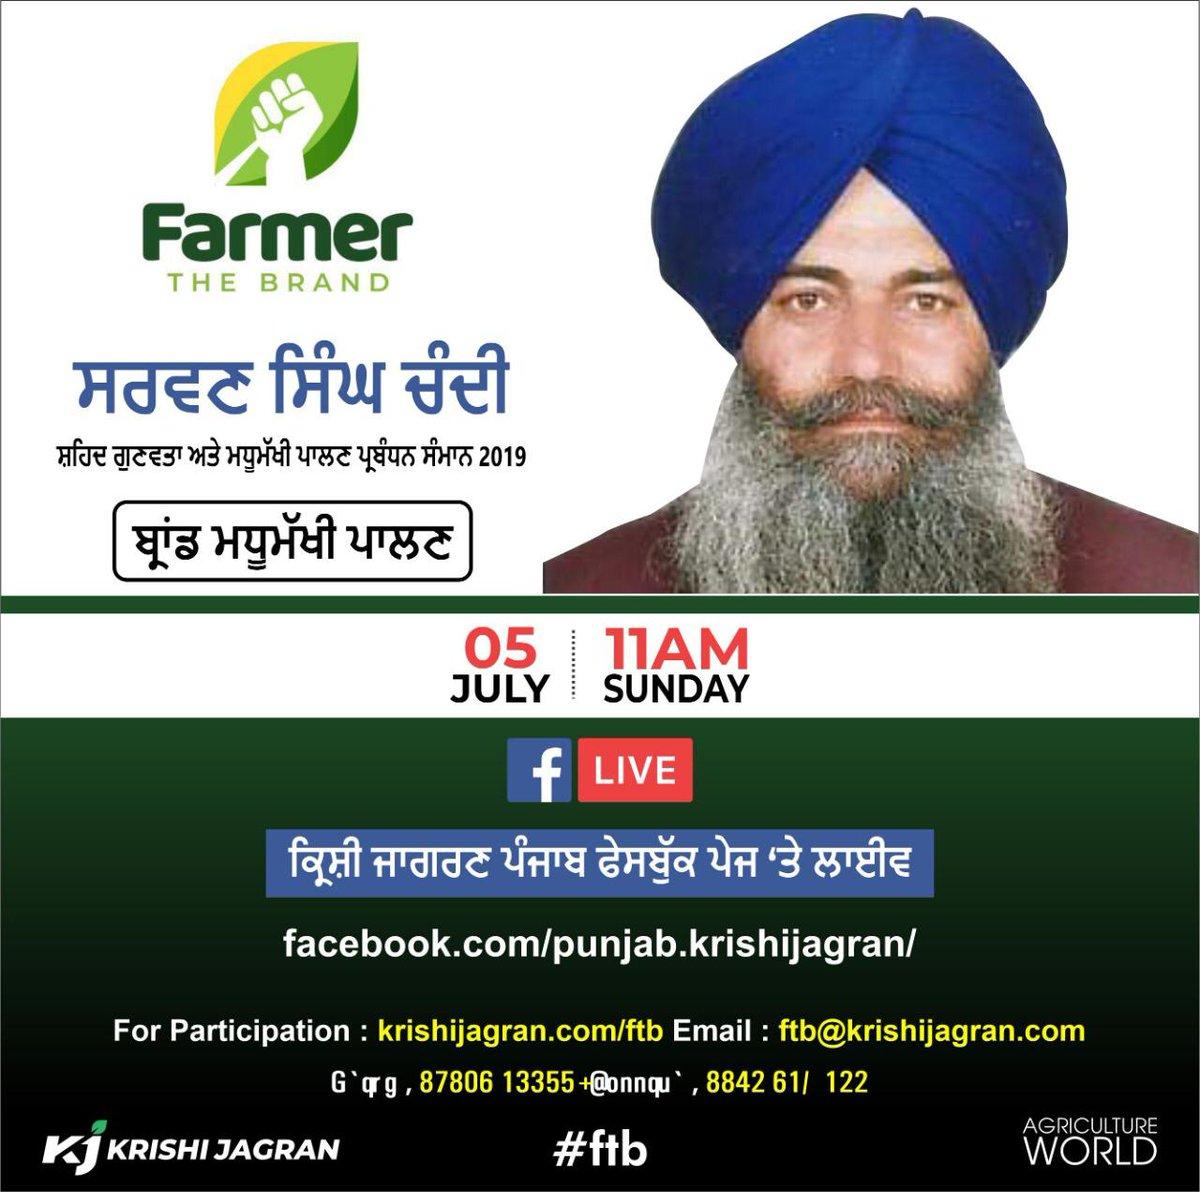 Live on Krishi Jagran Punjab Facebook  At http://facebook.com/Punjab.krishijagran…  Date: 05-July-2020 Time: 11:00 am onwards  #ftb #krishijagran #farmerthebrand #brandthefarmer #farmer #brand #farming #agriculture #agricultureworld #live #facebooklive #success #punjabi #punjabpic.twitter.com/ai7HYn6y8n